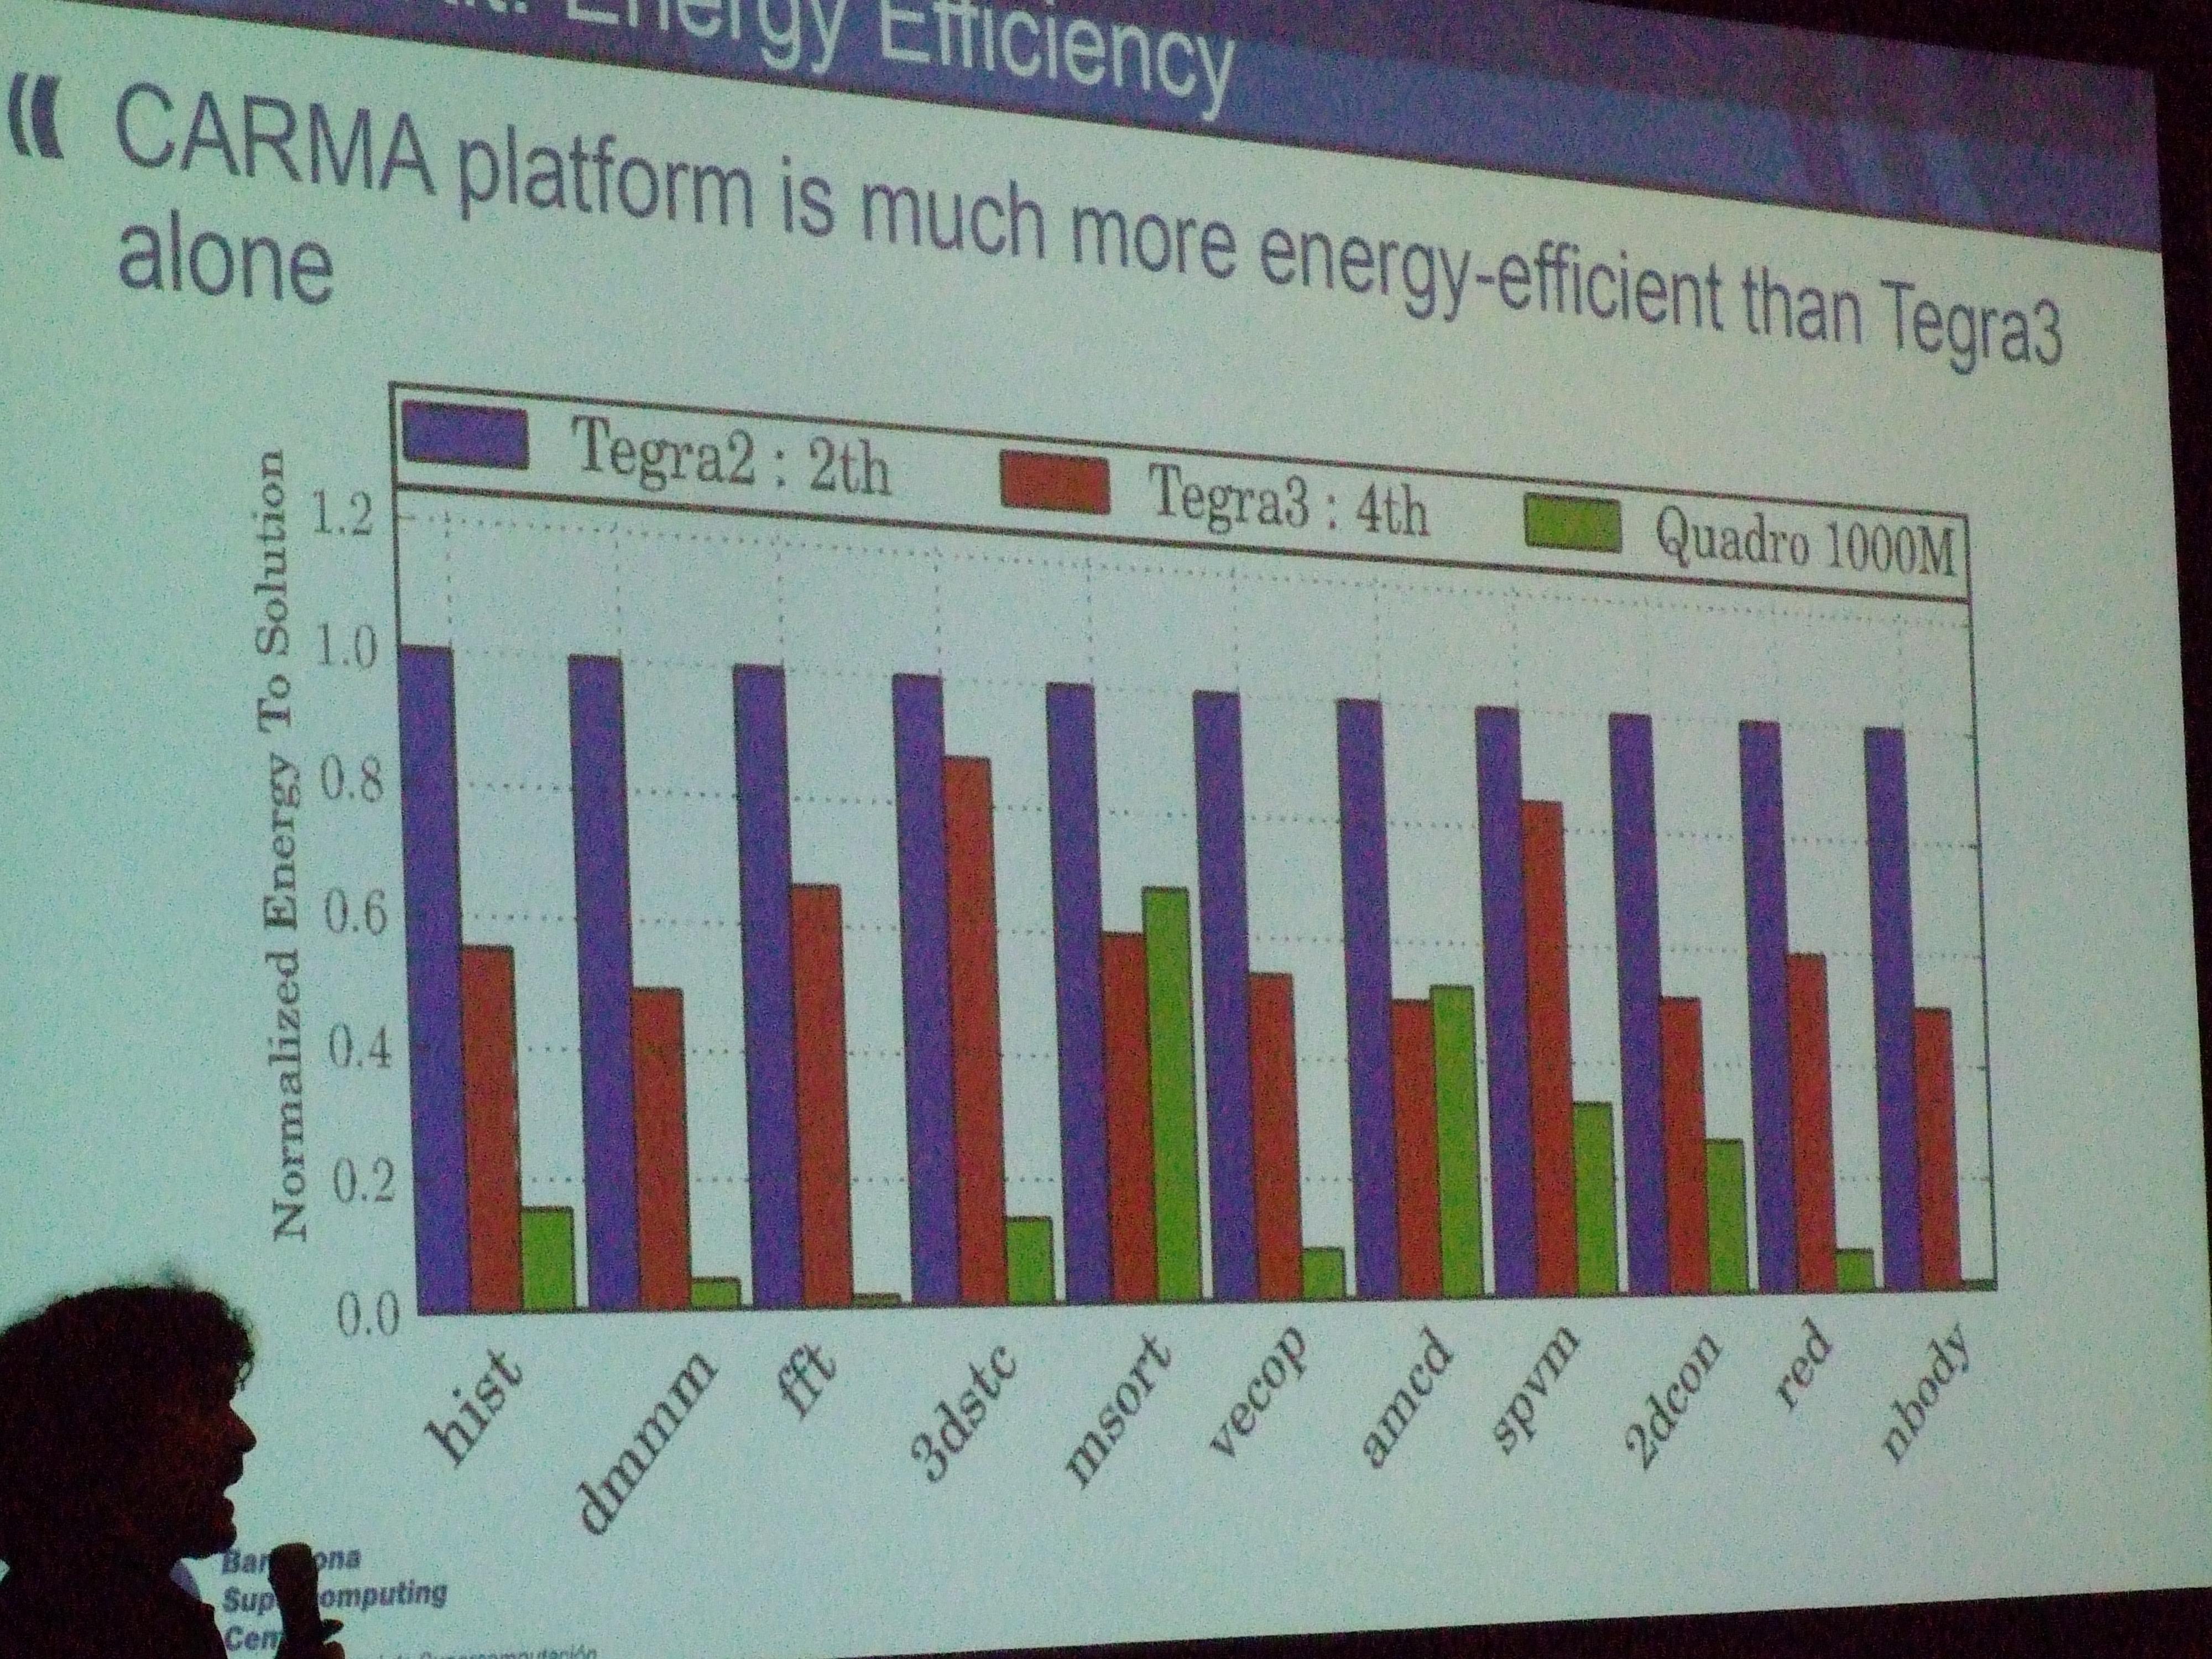 GTC 2013: Pedraforca Is A Power Efficient ARM + GPU Cluster For Homogeneous (GPU) Workloads - General Tech 3